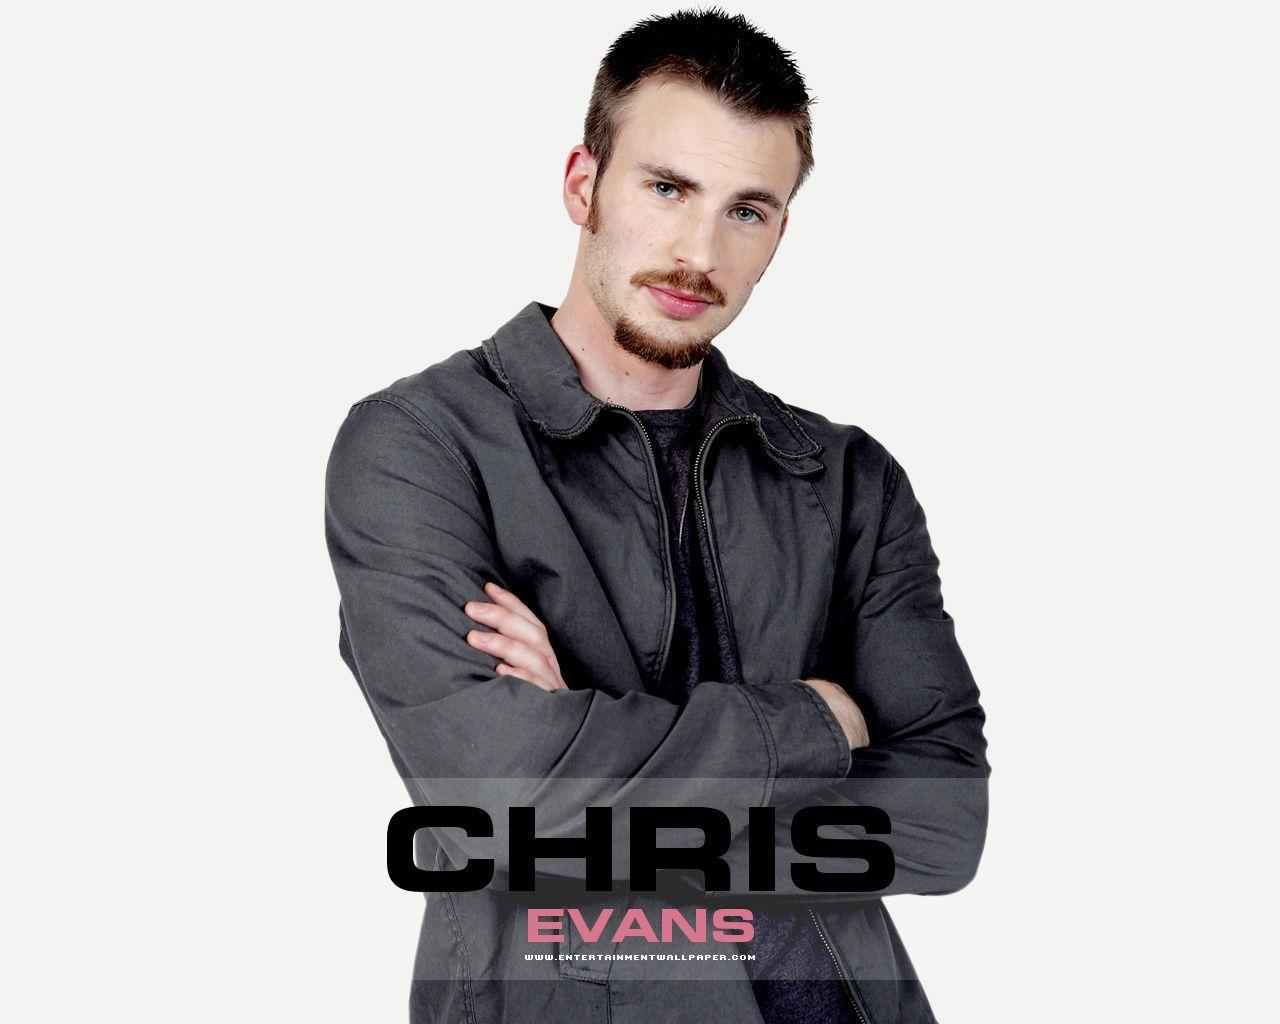 Chris Evans Wallpapers 1280x1024